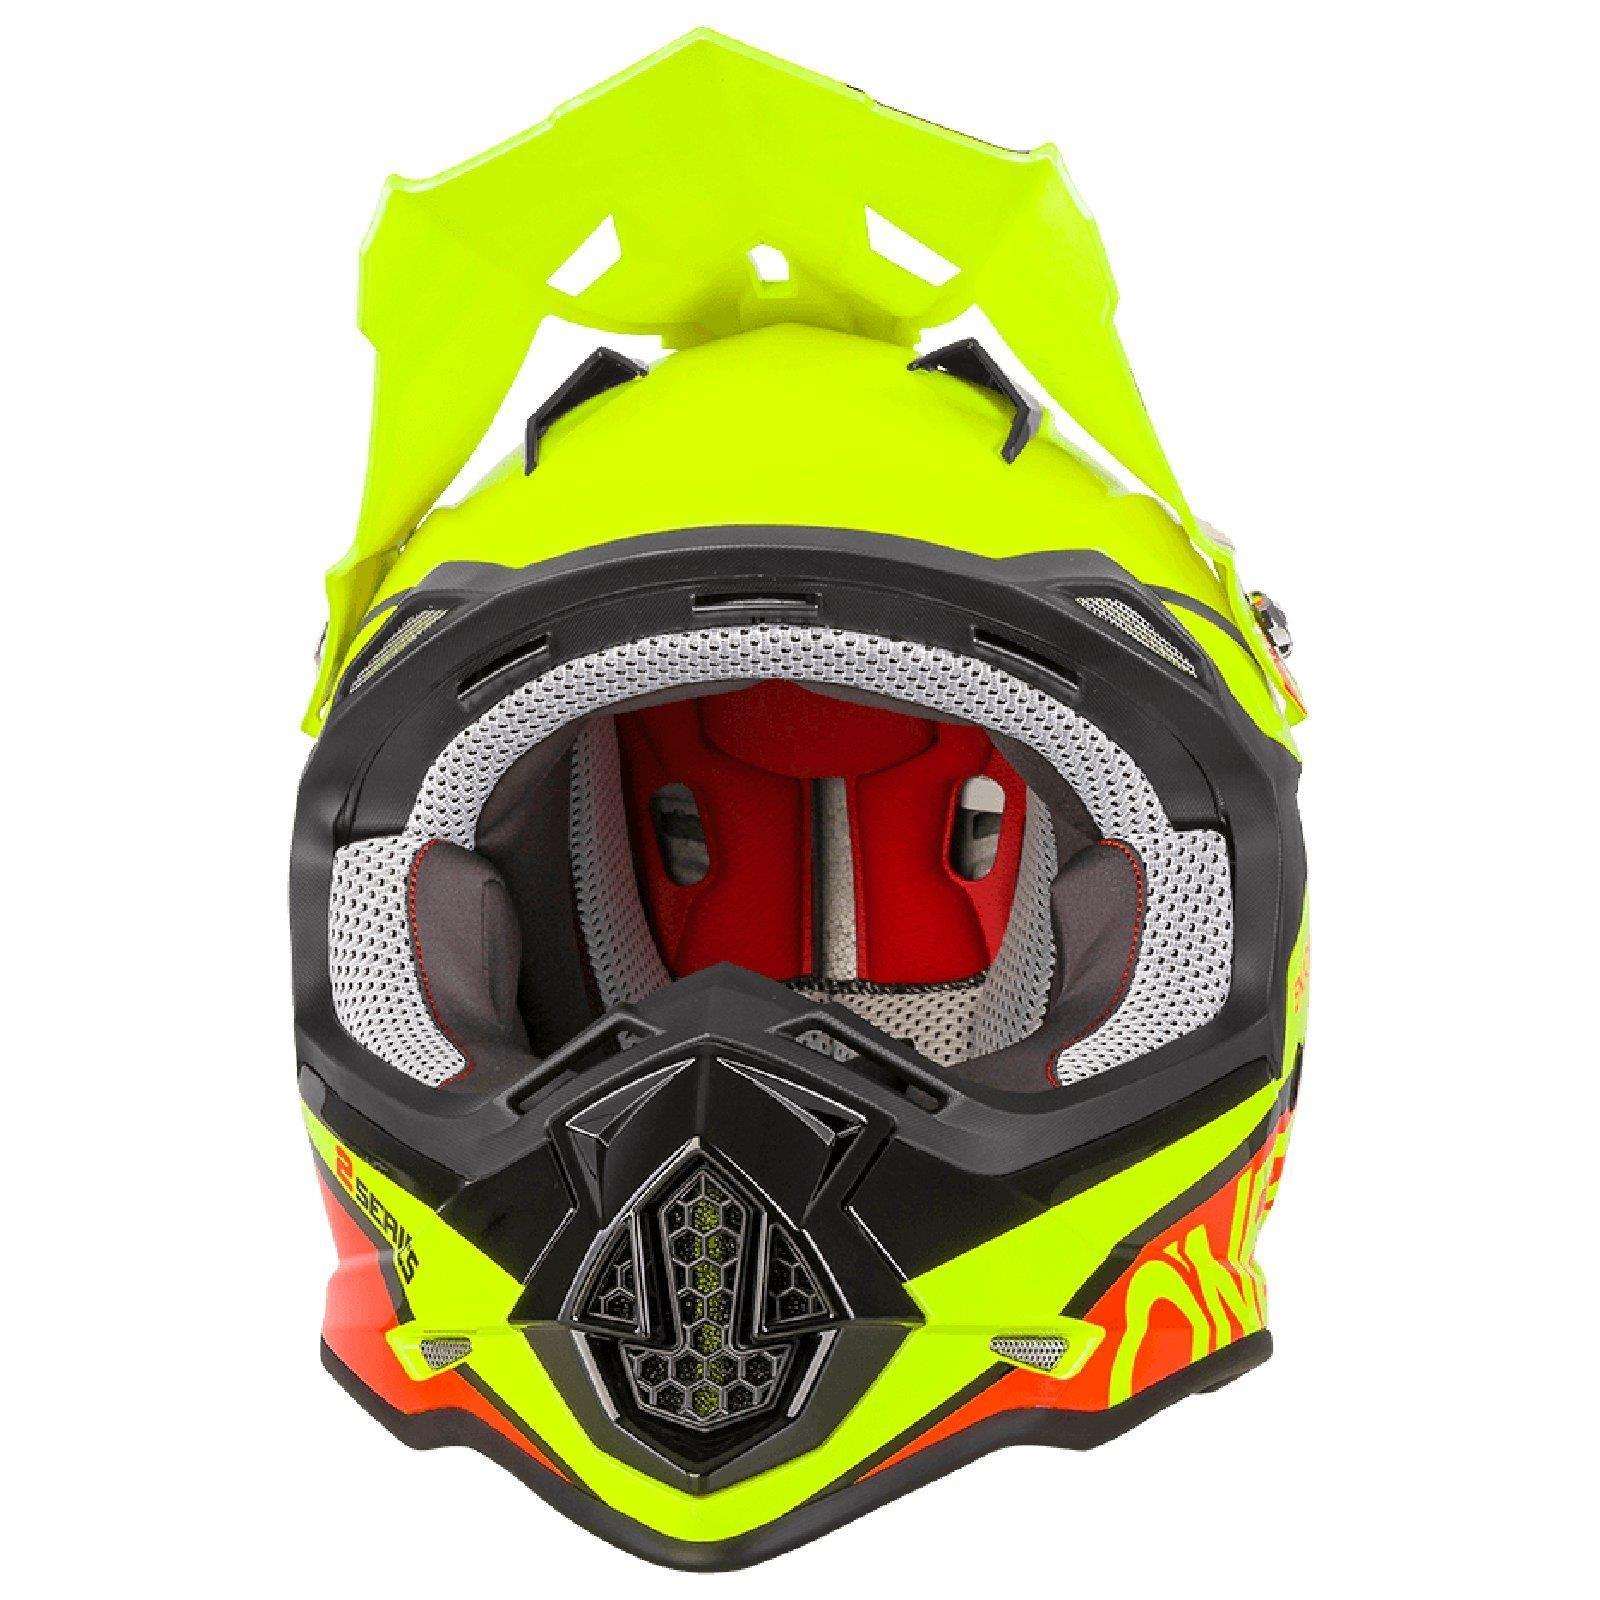 ONEAL-2-Series-RL-SPYDE-moto-cross-MX-Casco-Enduro-Trail-QUAD-OFFROAD-MOTO miniatura 14